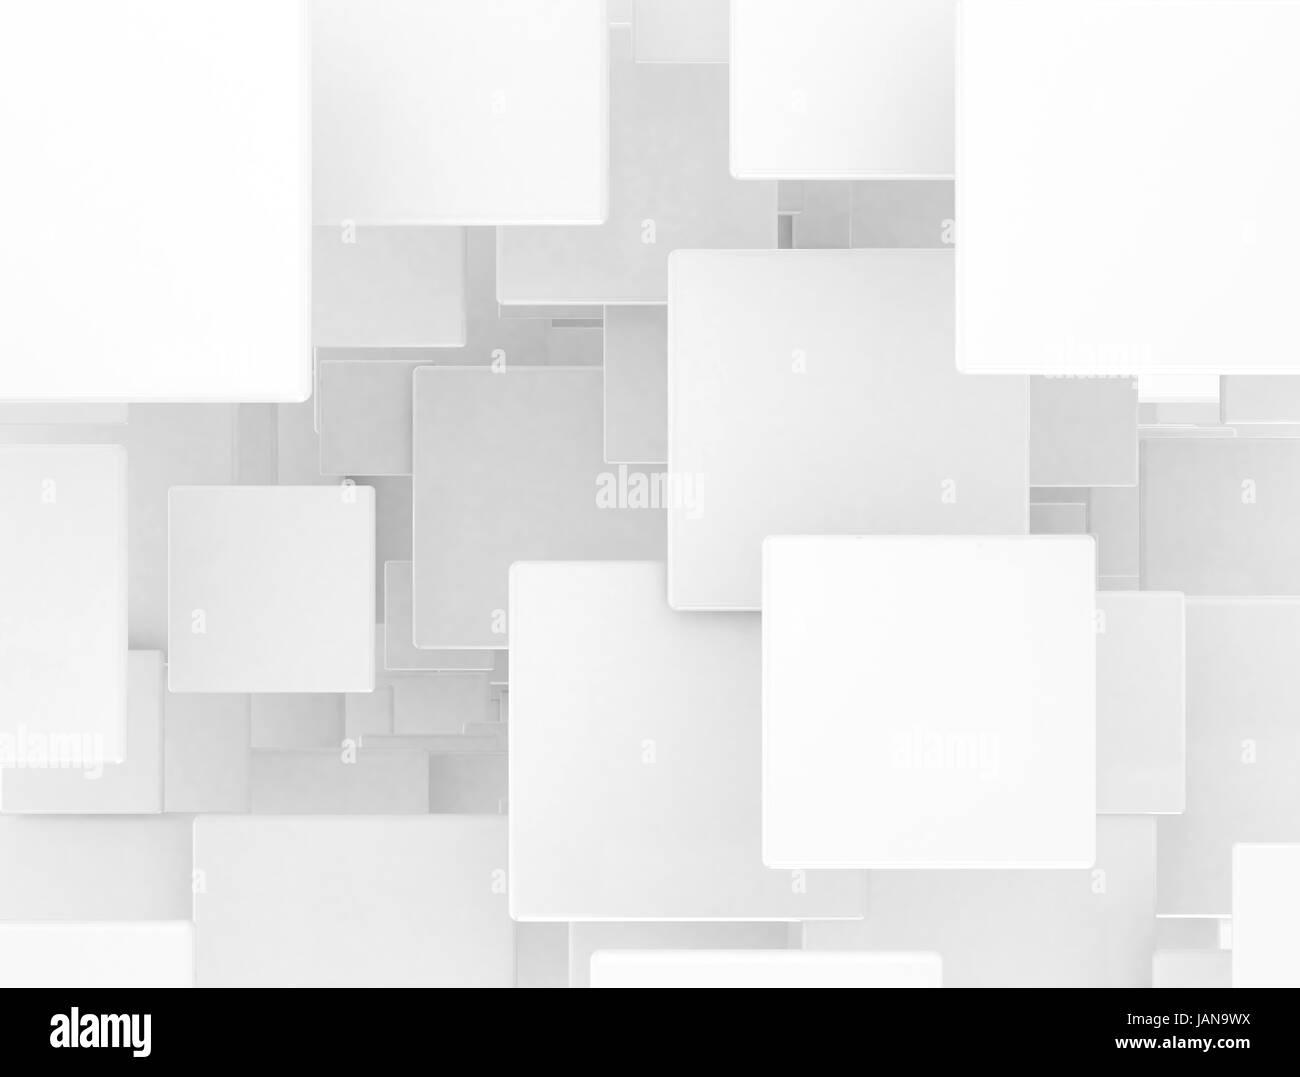 Nett Leere Quadrate Vorlage Bilder - Entry Level Resume Vorlagen ...